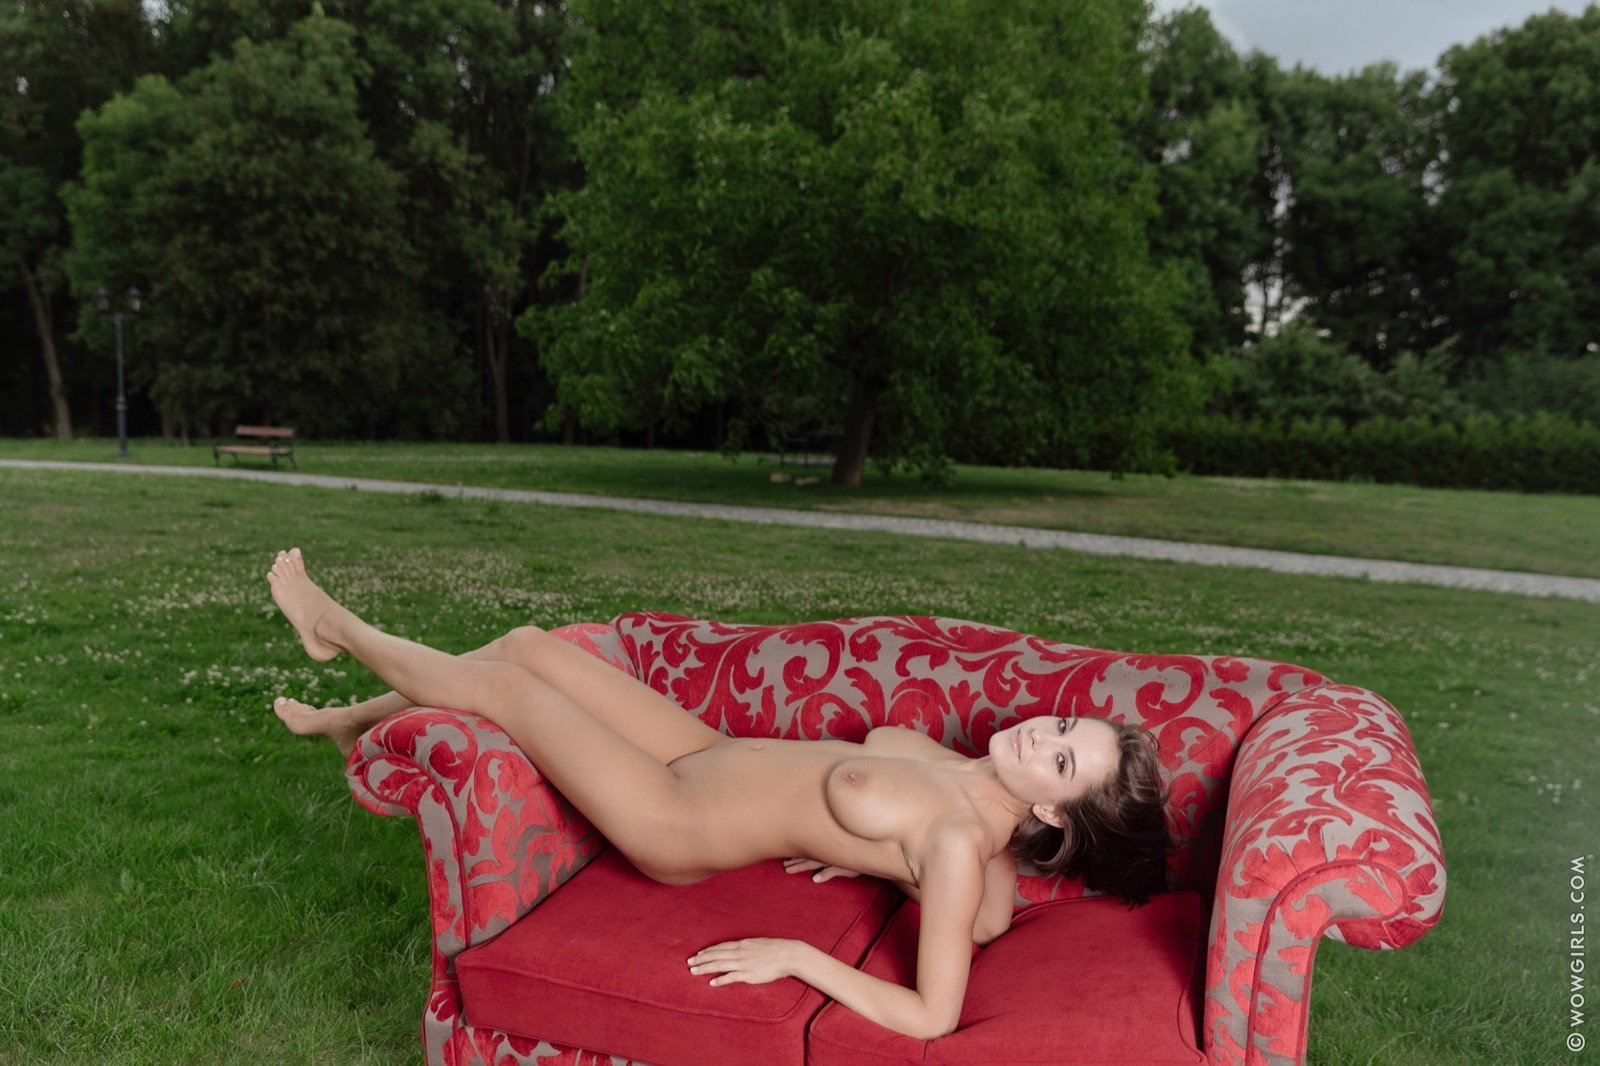 sexy girl braless dress hot legs